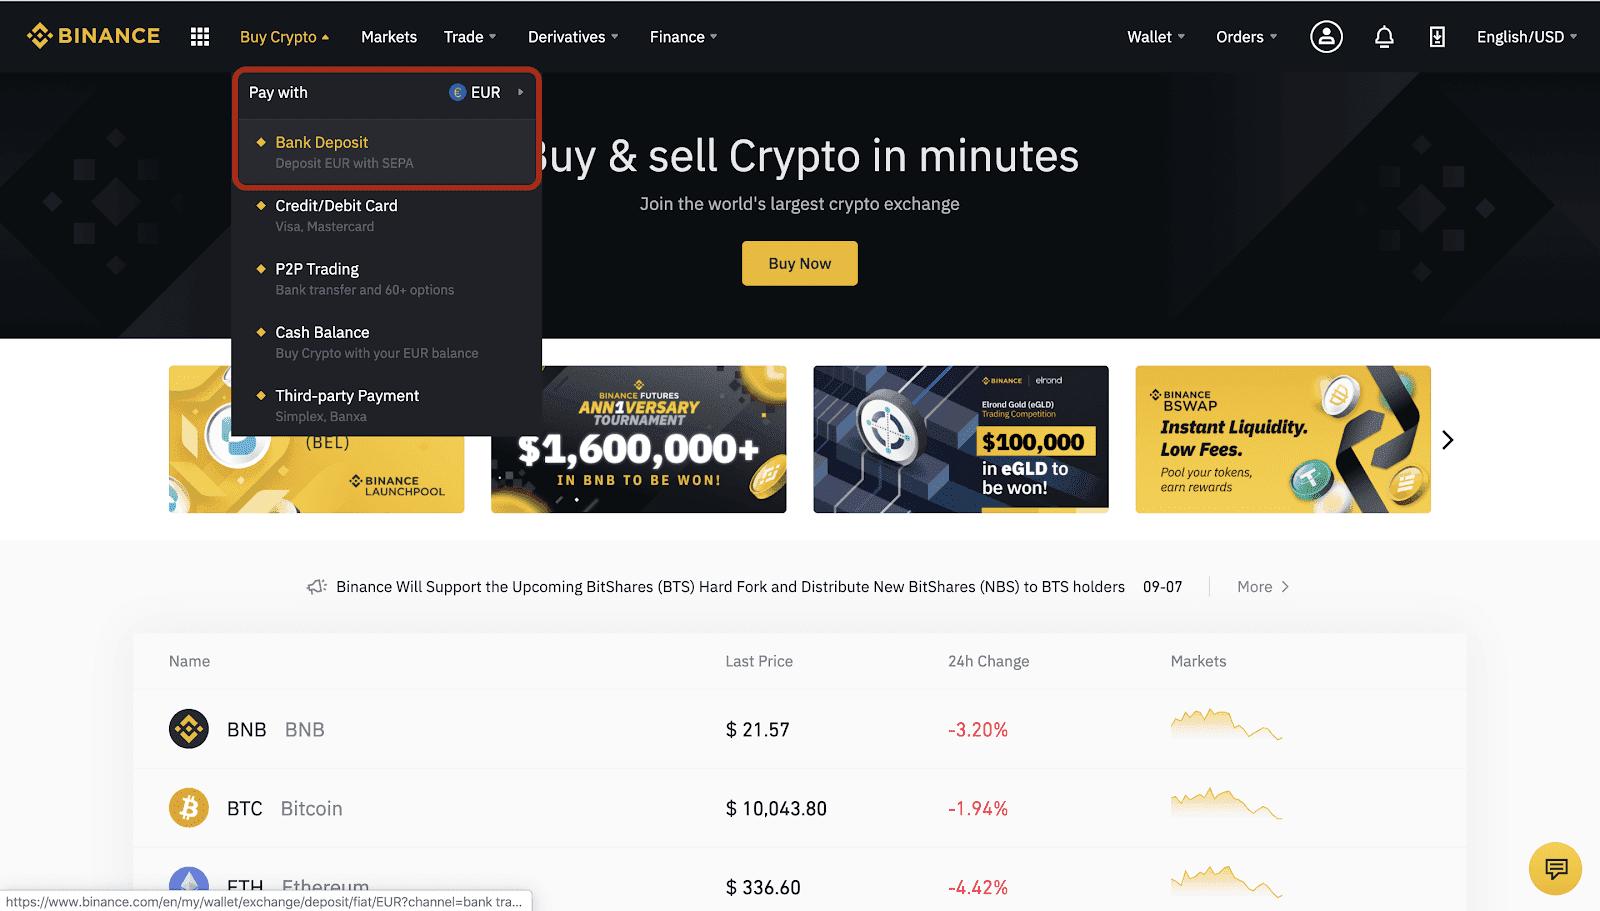 binance btc tempo deposito bitcoin nessuna verifica